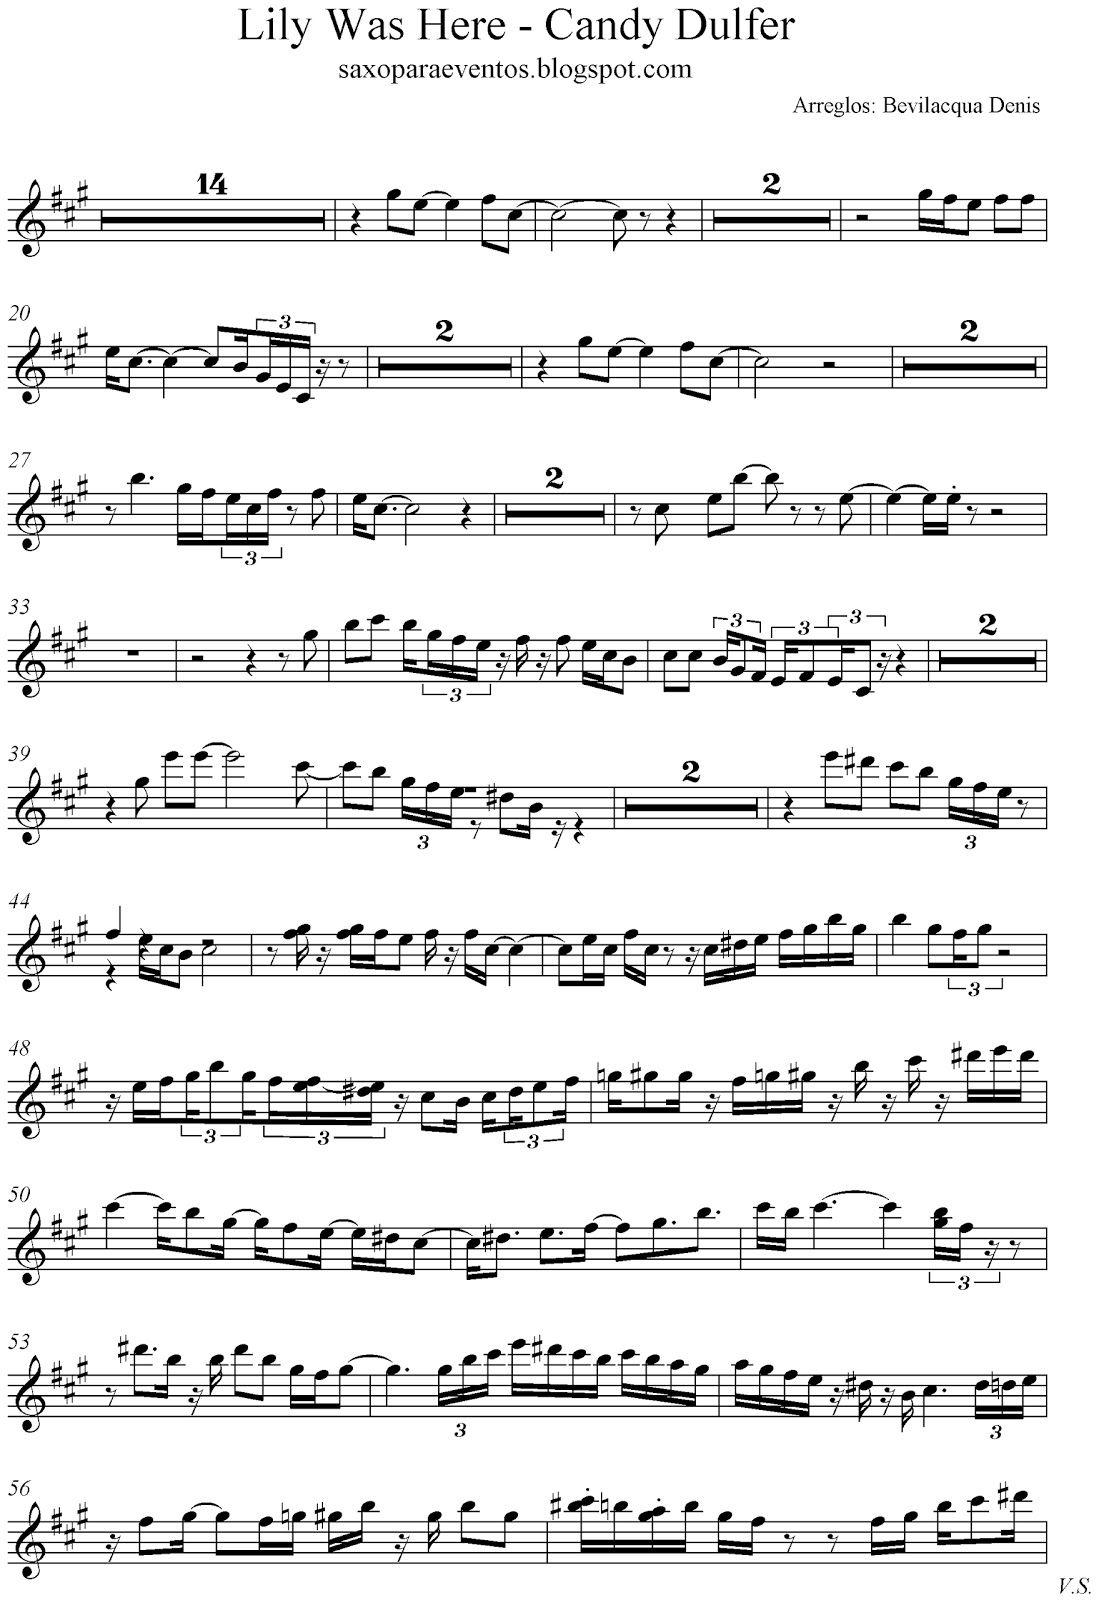 Candy Dulfer Lily Was Here 1 Saxofón Alto 0001 Bmp 1 099 1 600 Pixels Alto Sax Sheet Music Saxophone Sheet Music Free Sheet Music